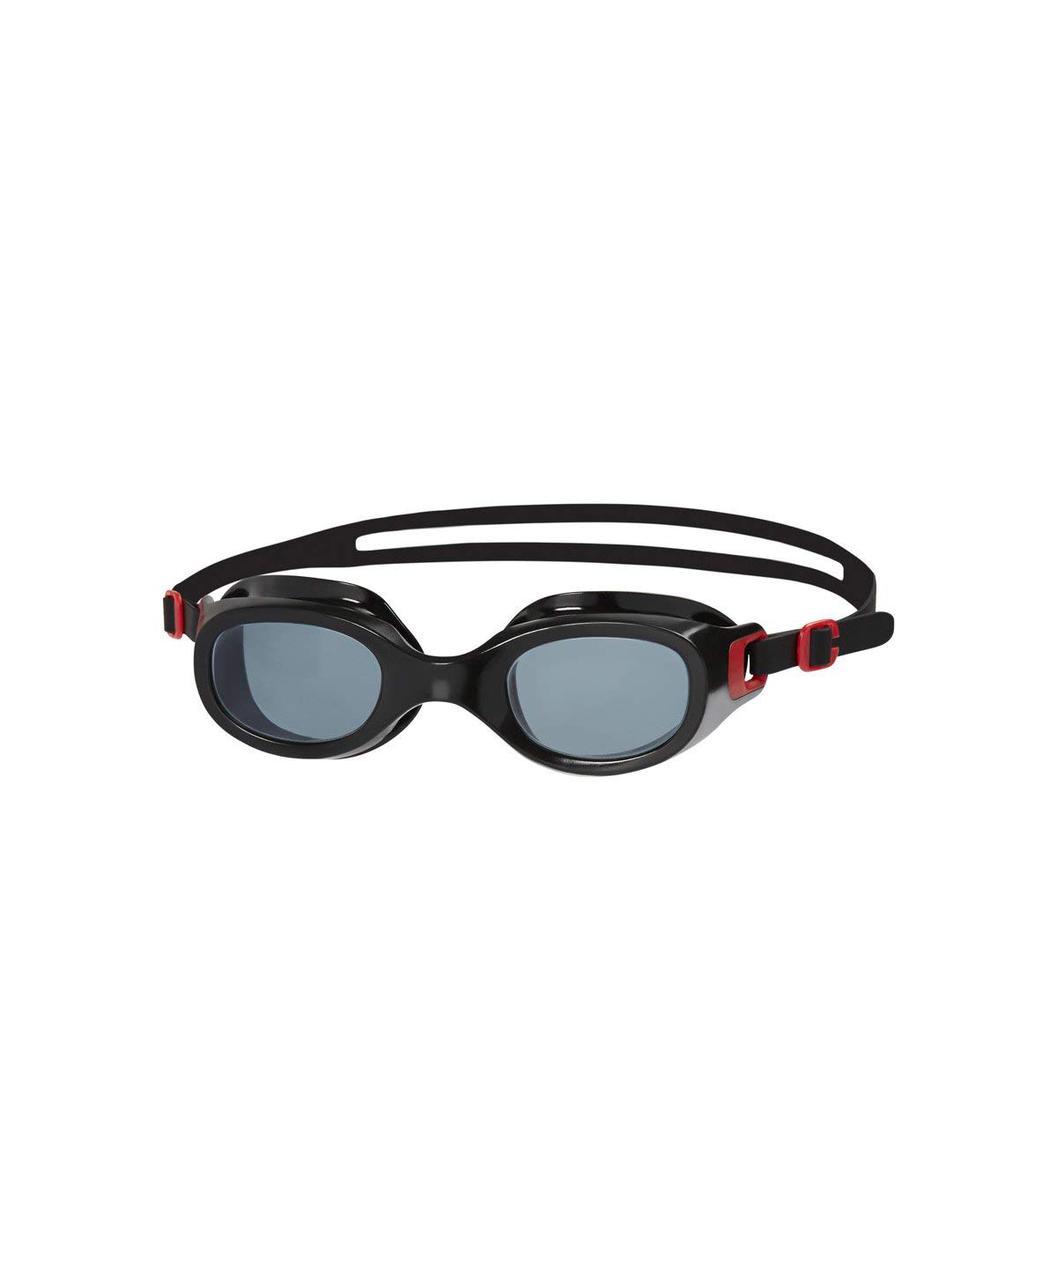 Очки для плавания Speedo Futura Classic 8-10898B572